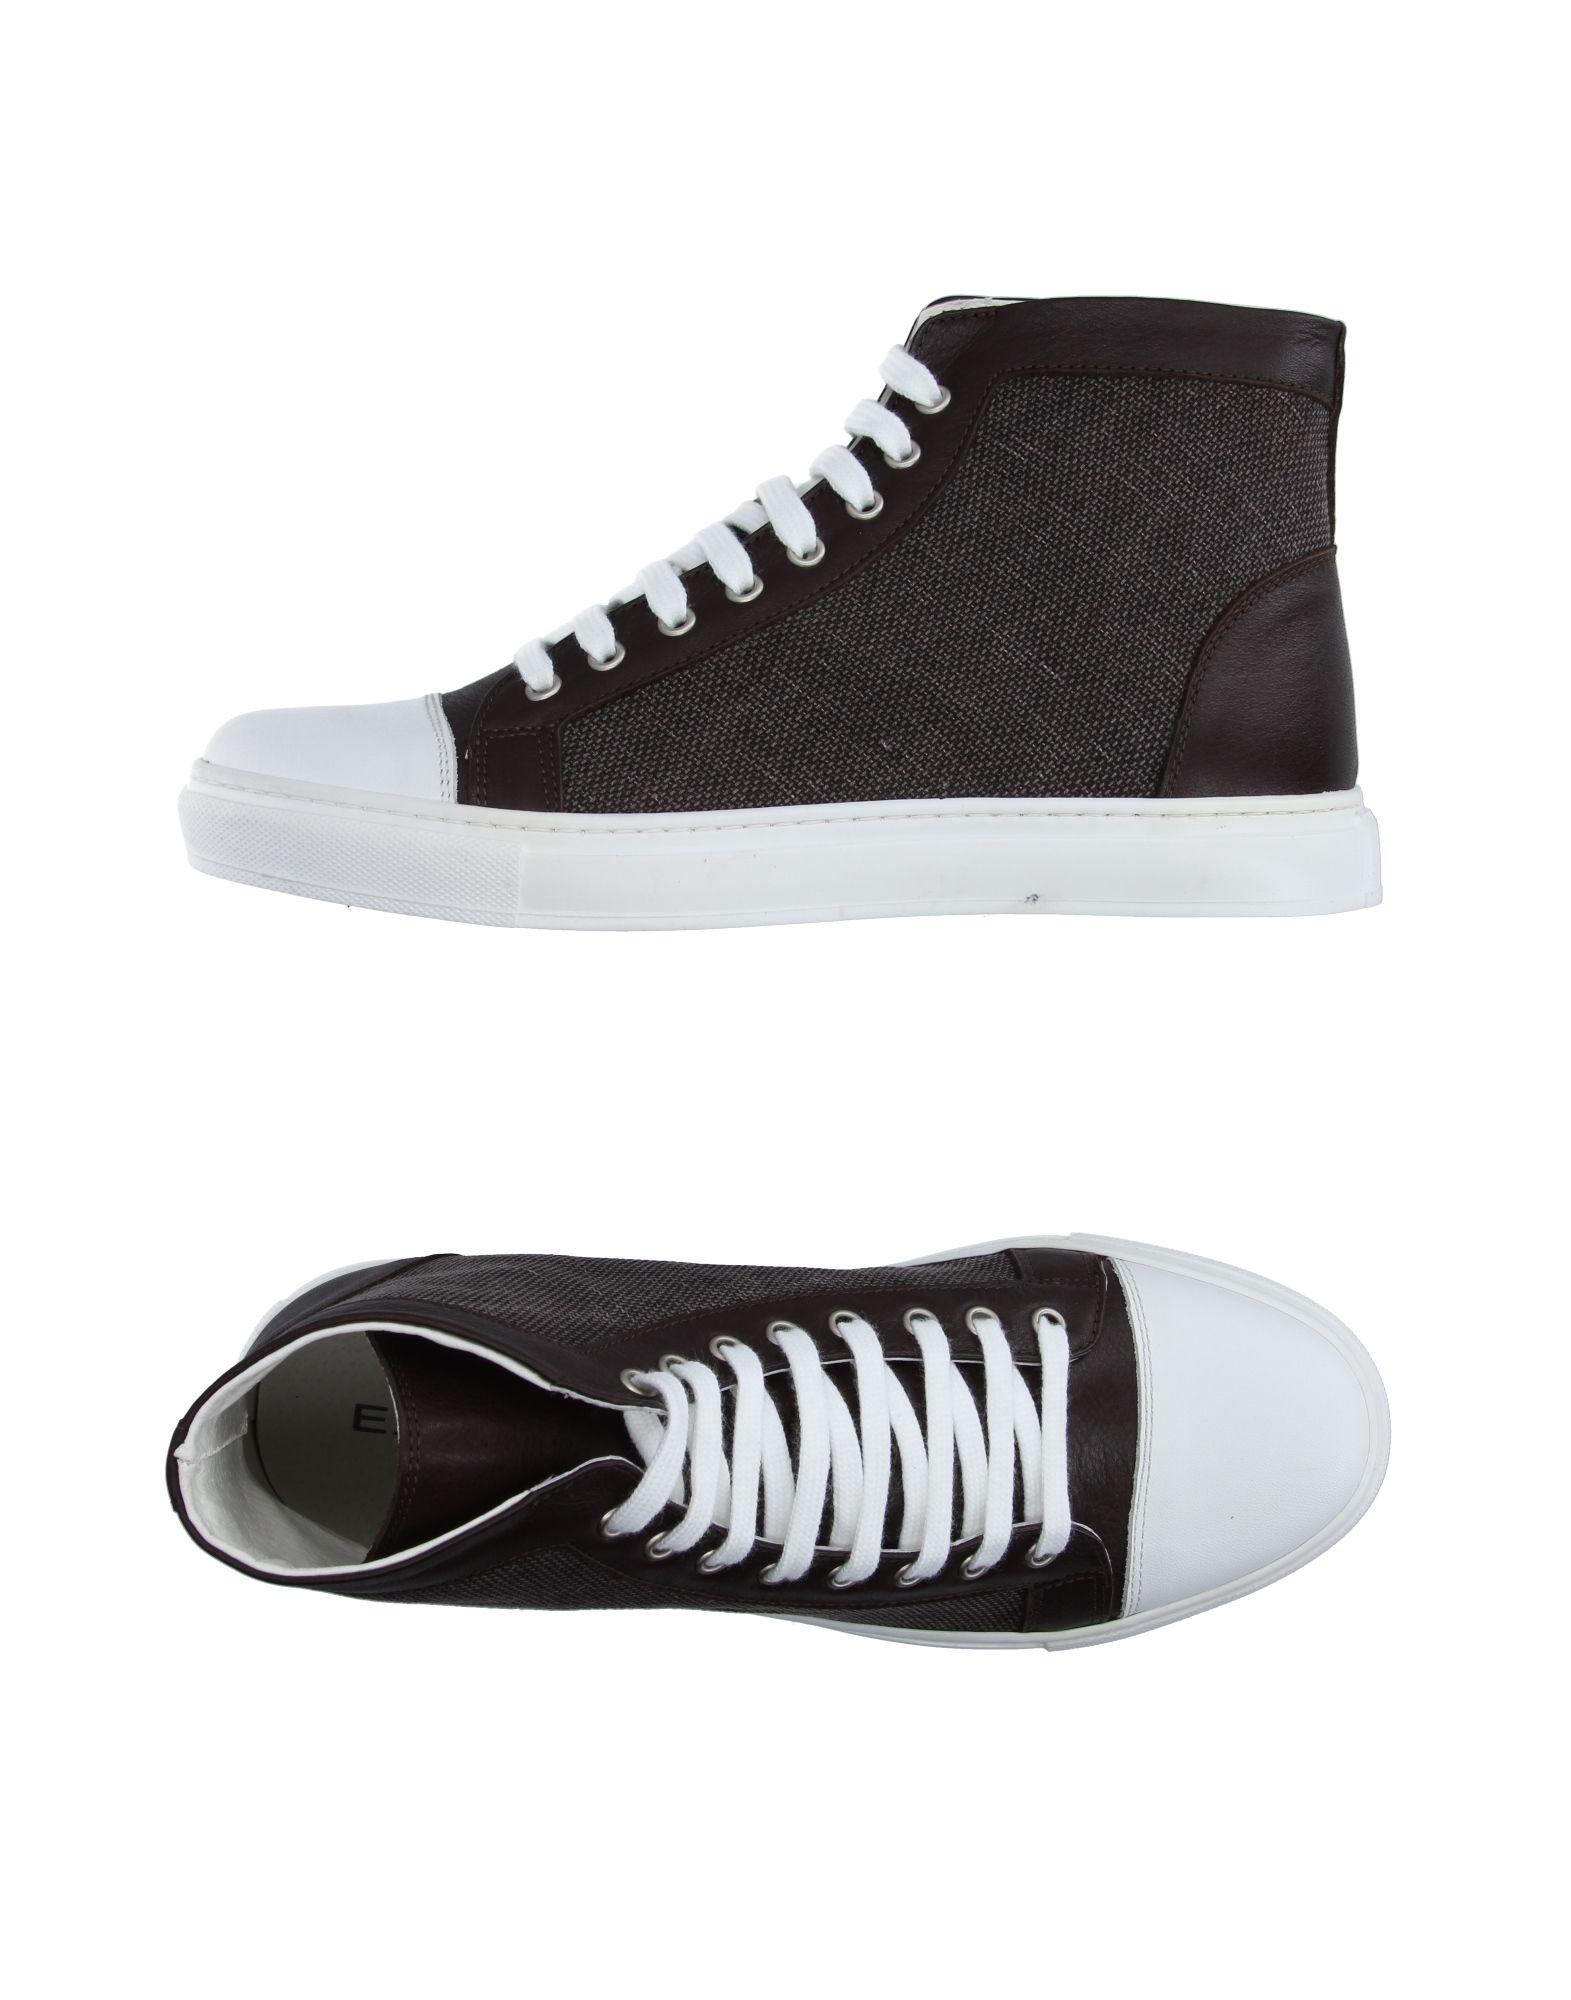 Sneakers Exibit Femme - Sneakers Exibit sur